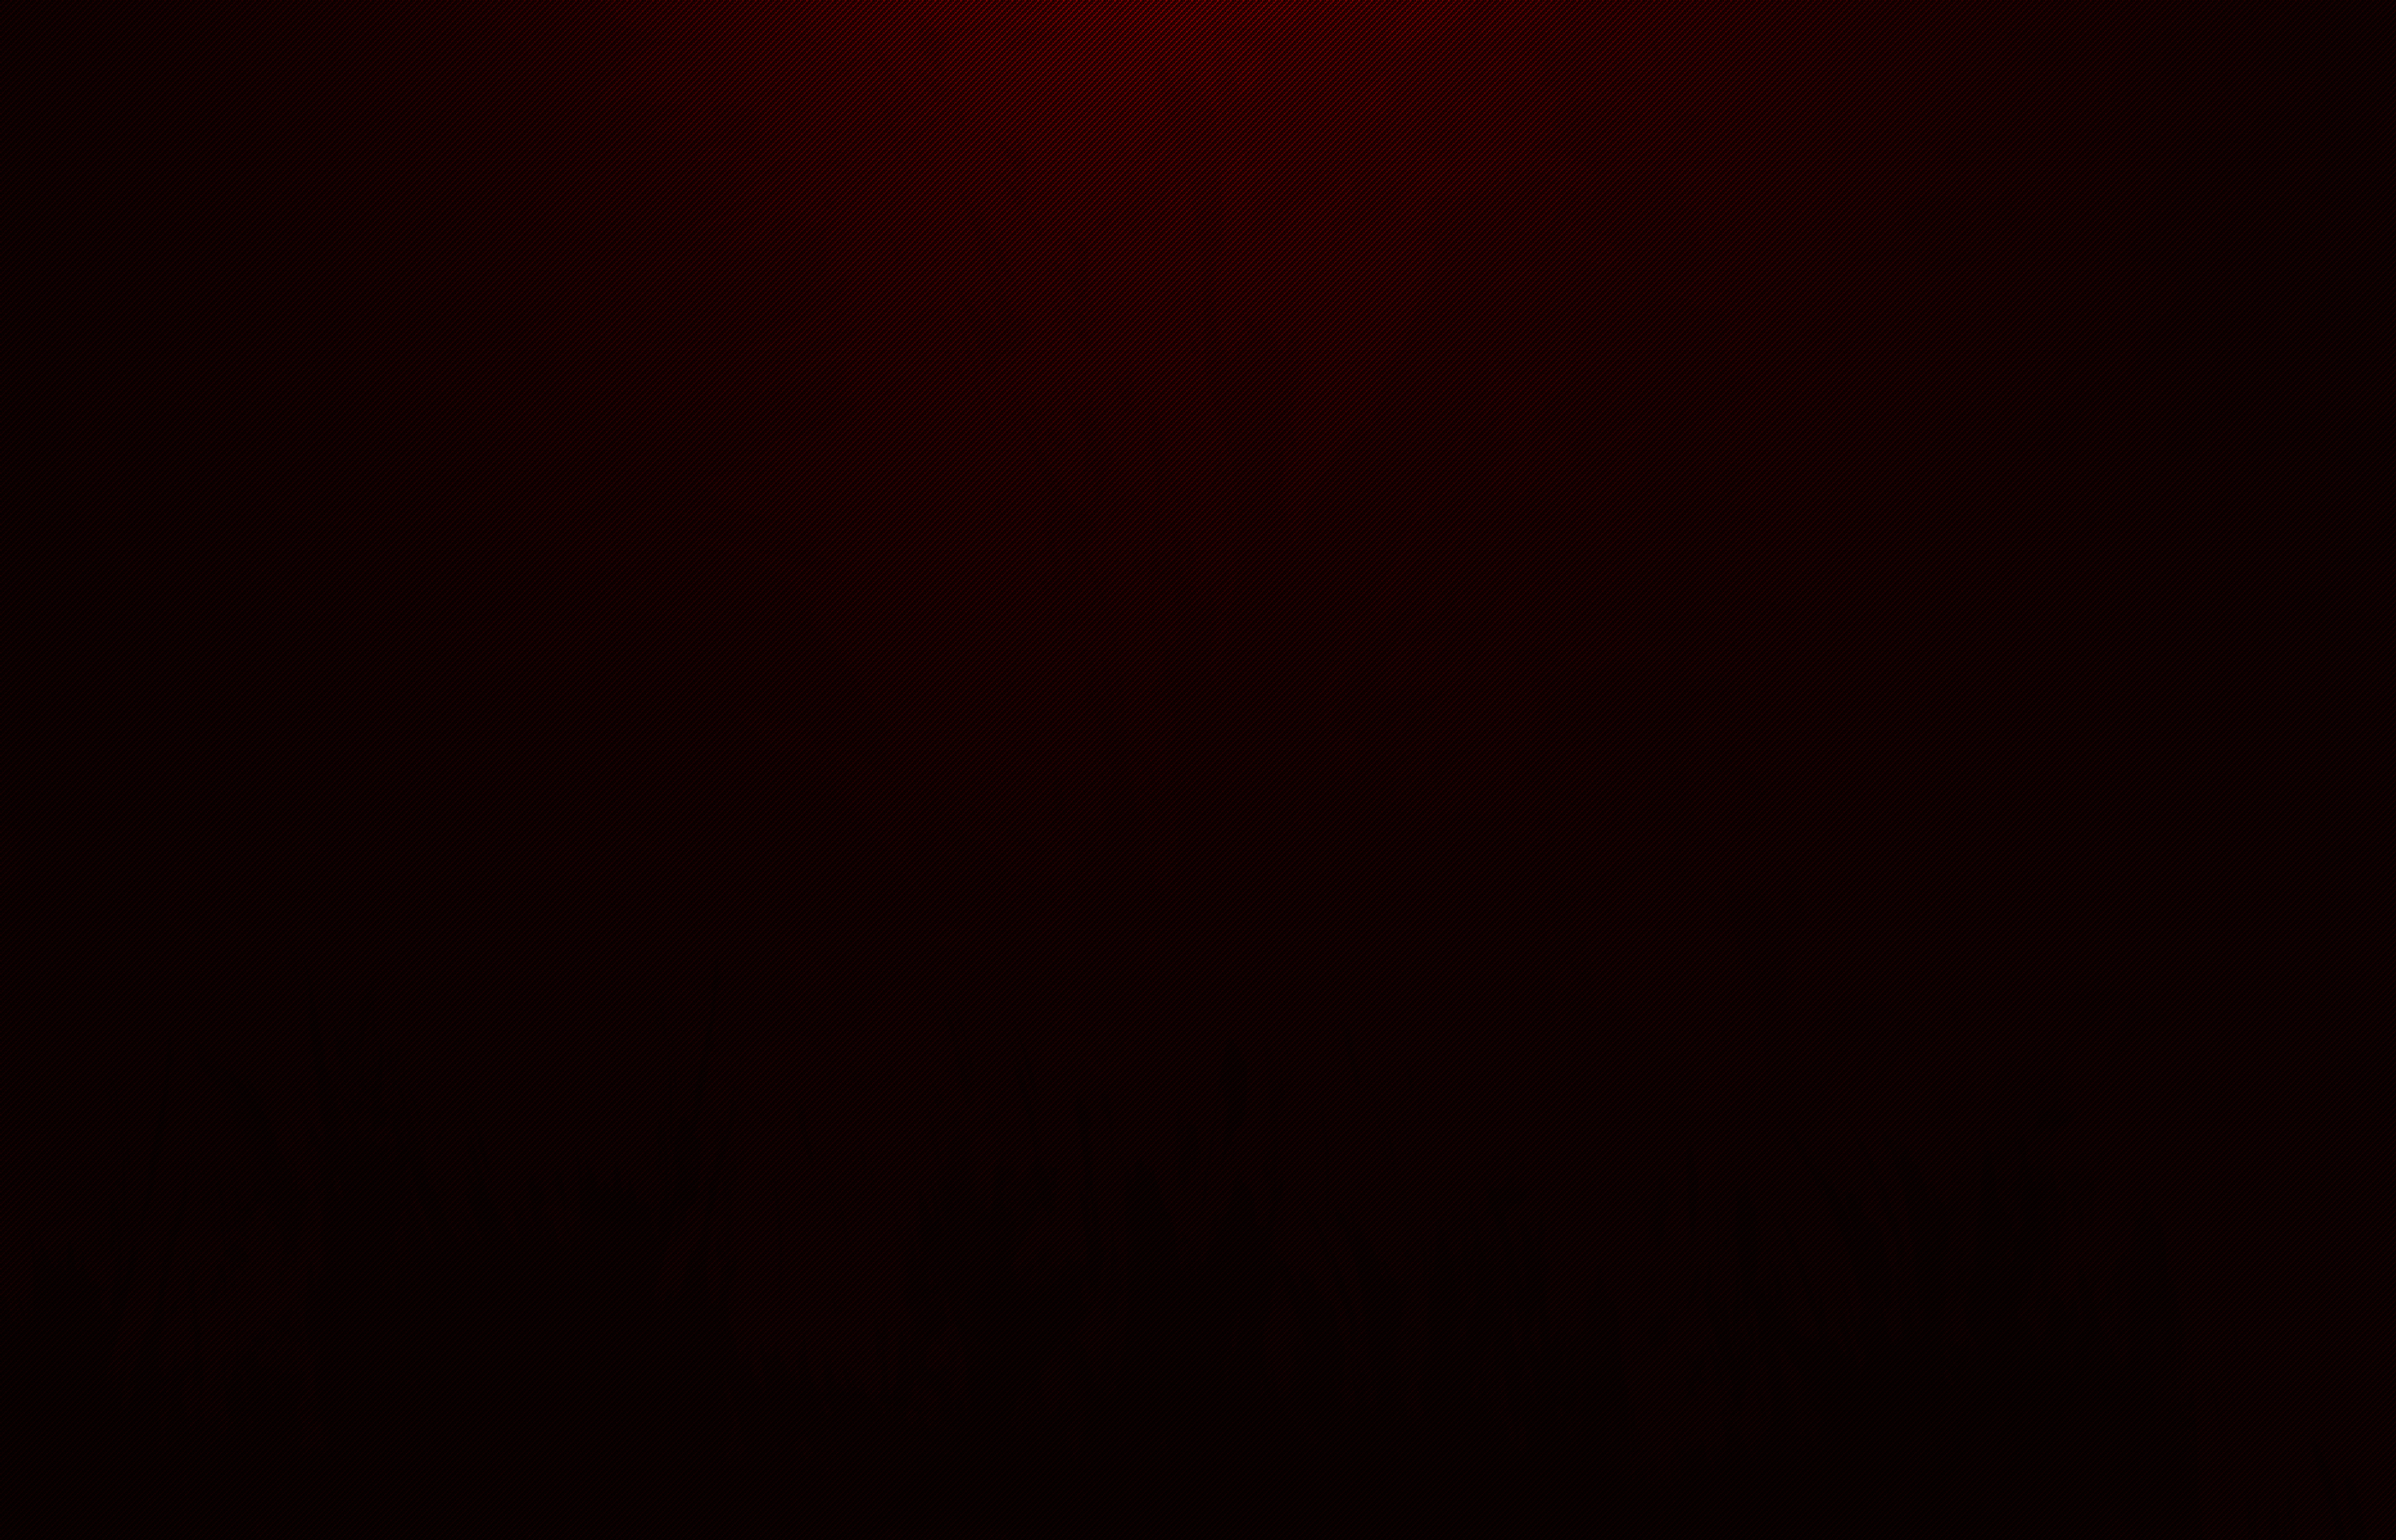 Dark Red Background Wallpaper images 2800x1800